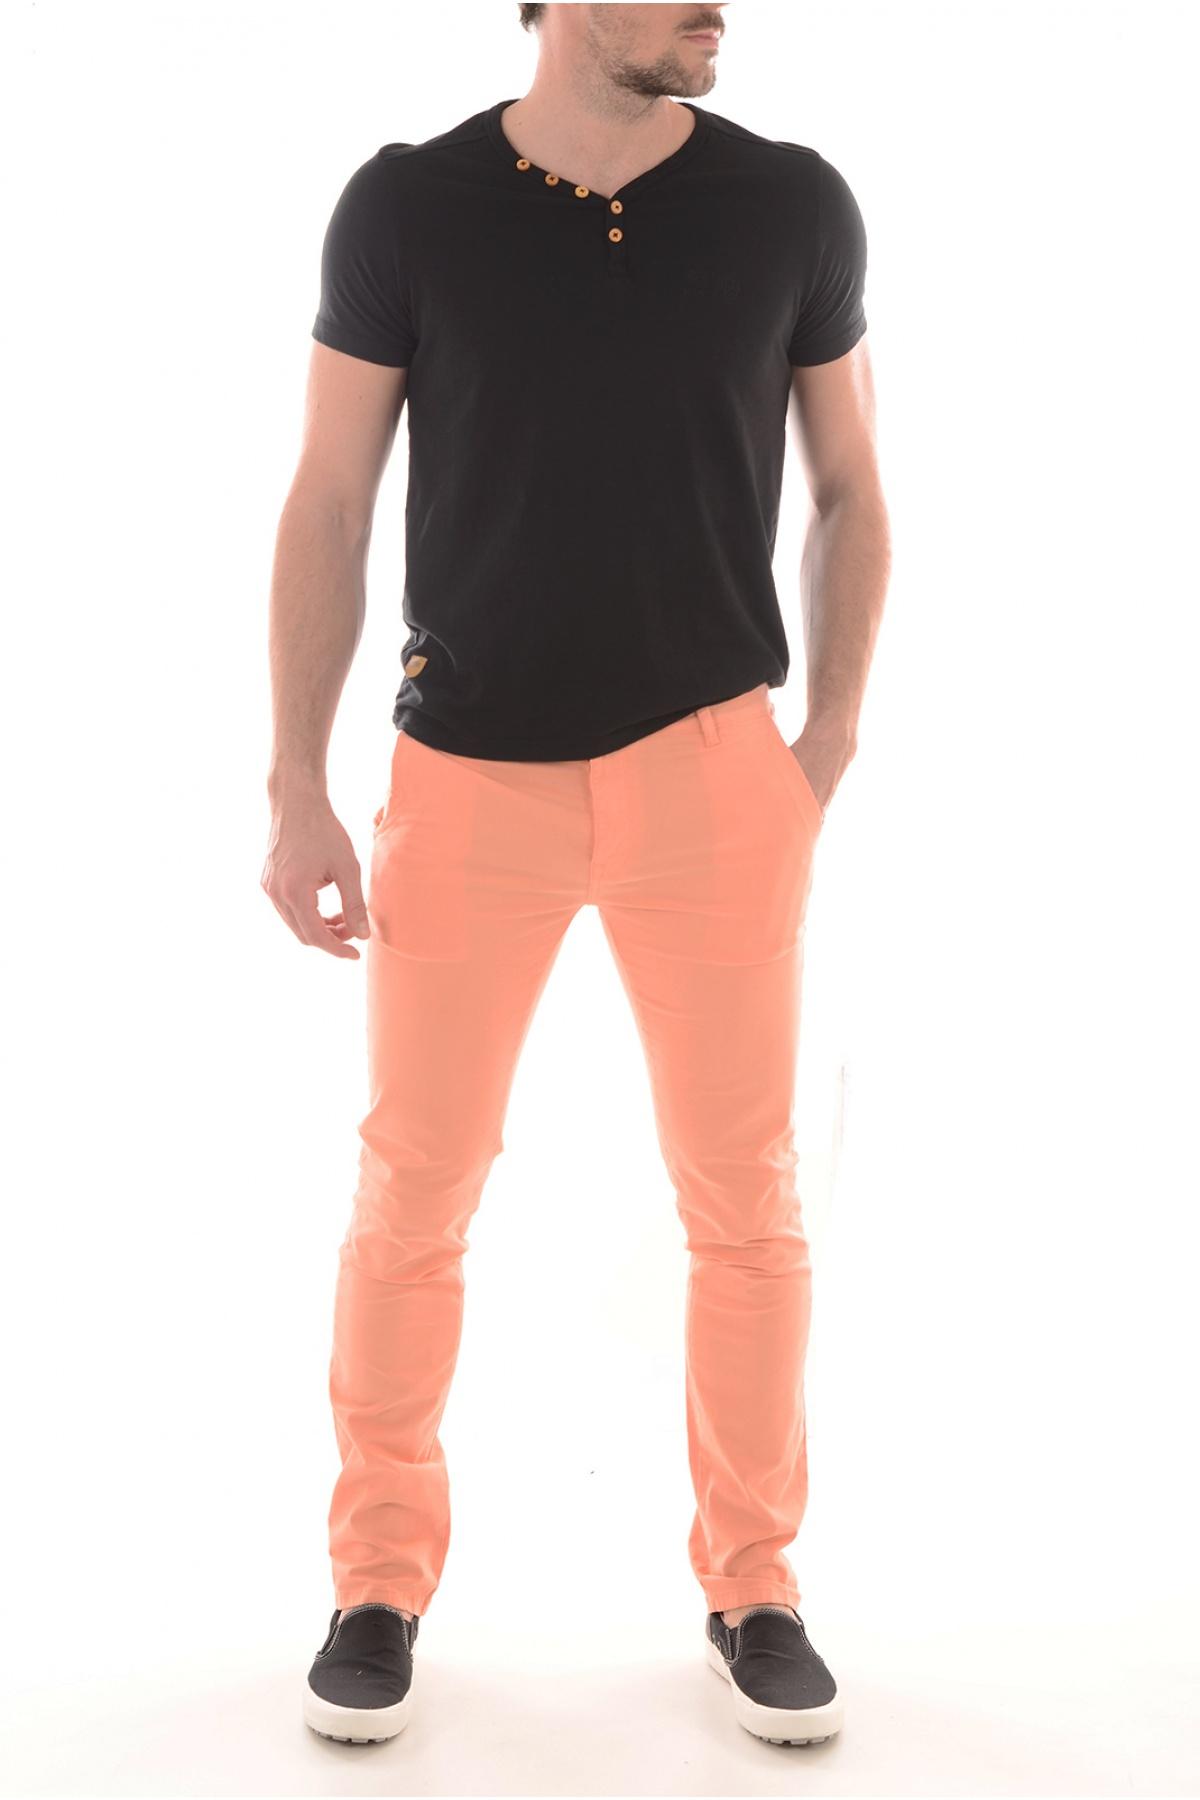 Pantalons-chino-citadin-CAPO-CLASSIC-WEAR-CLASSIC-WEAR